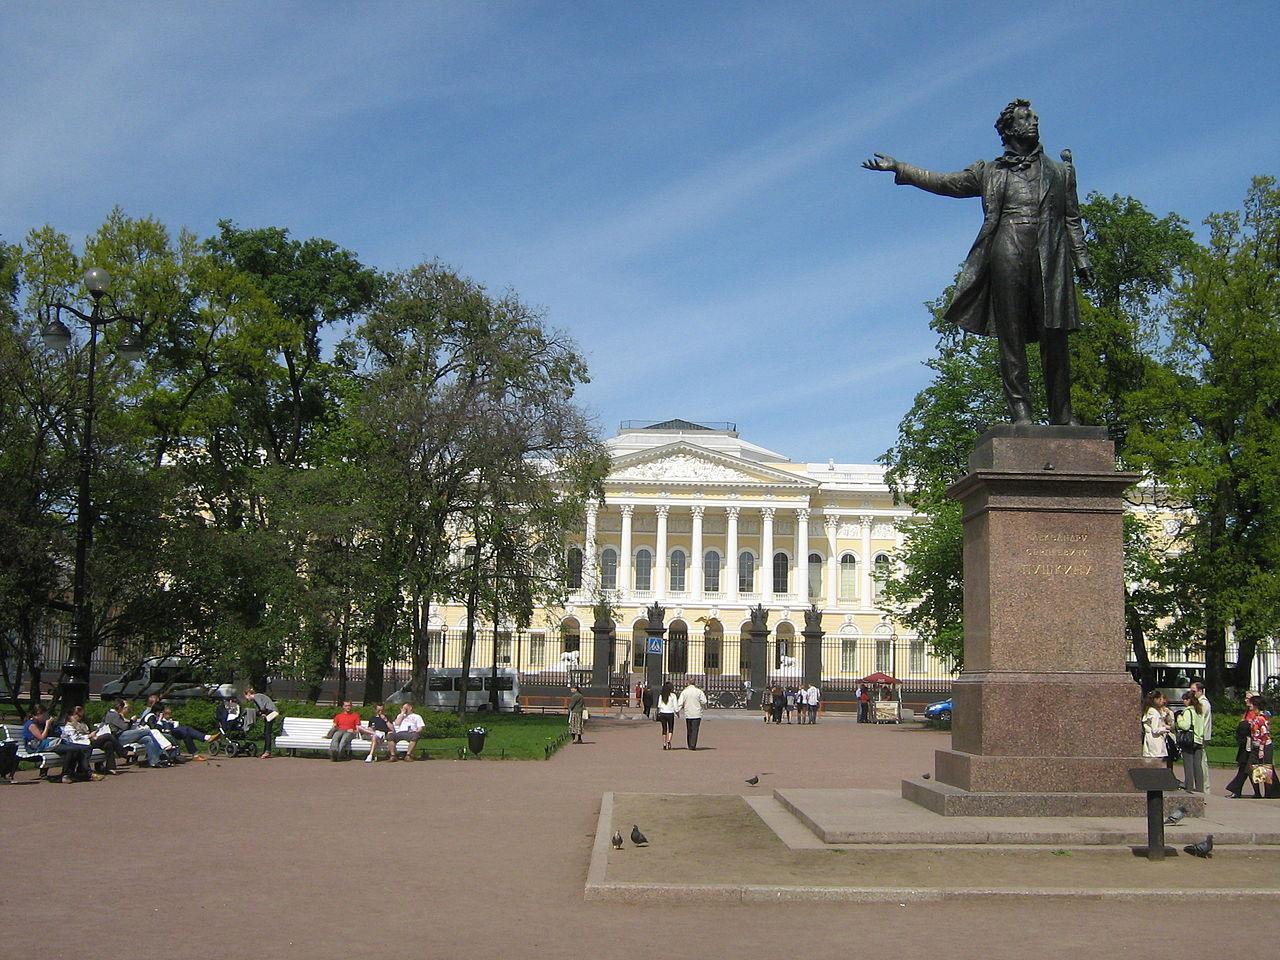 Санкт-Петербург. Площадь Искусств. Автор фото: Peterburg23 (Wikimedia Commons)